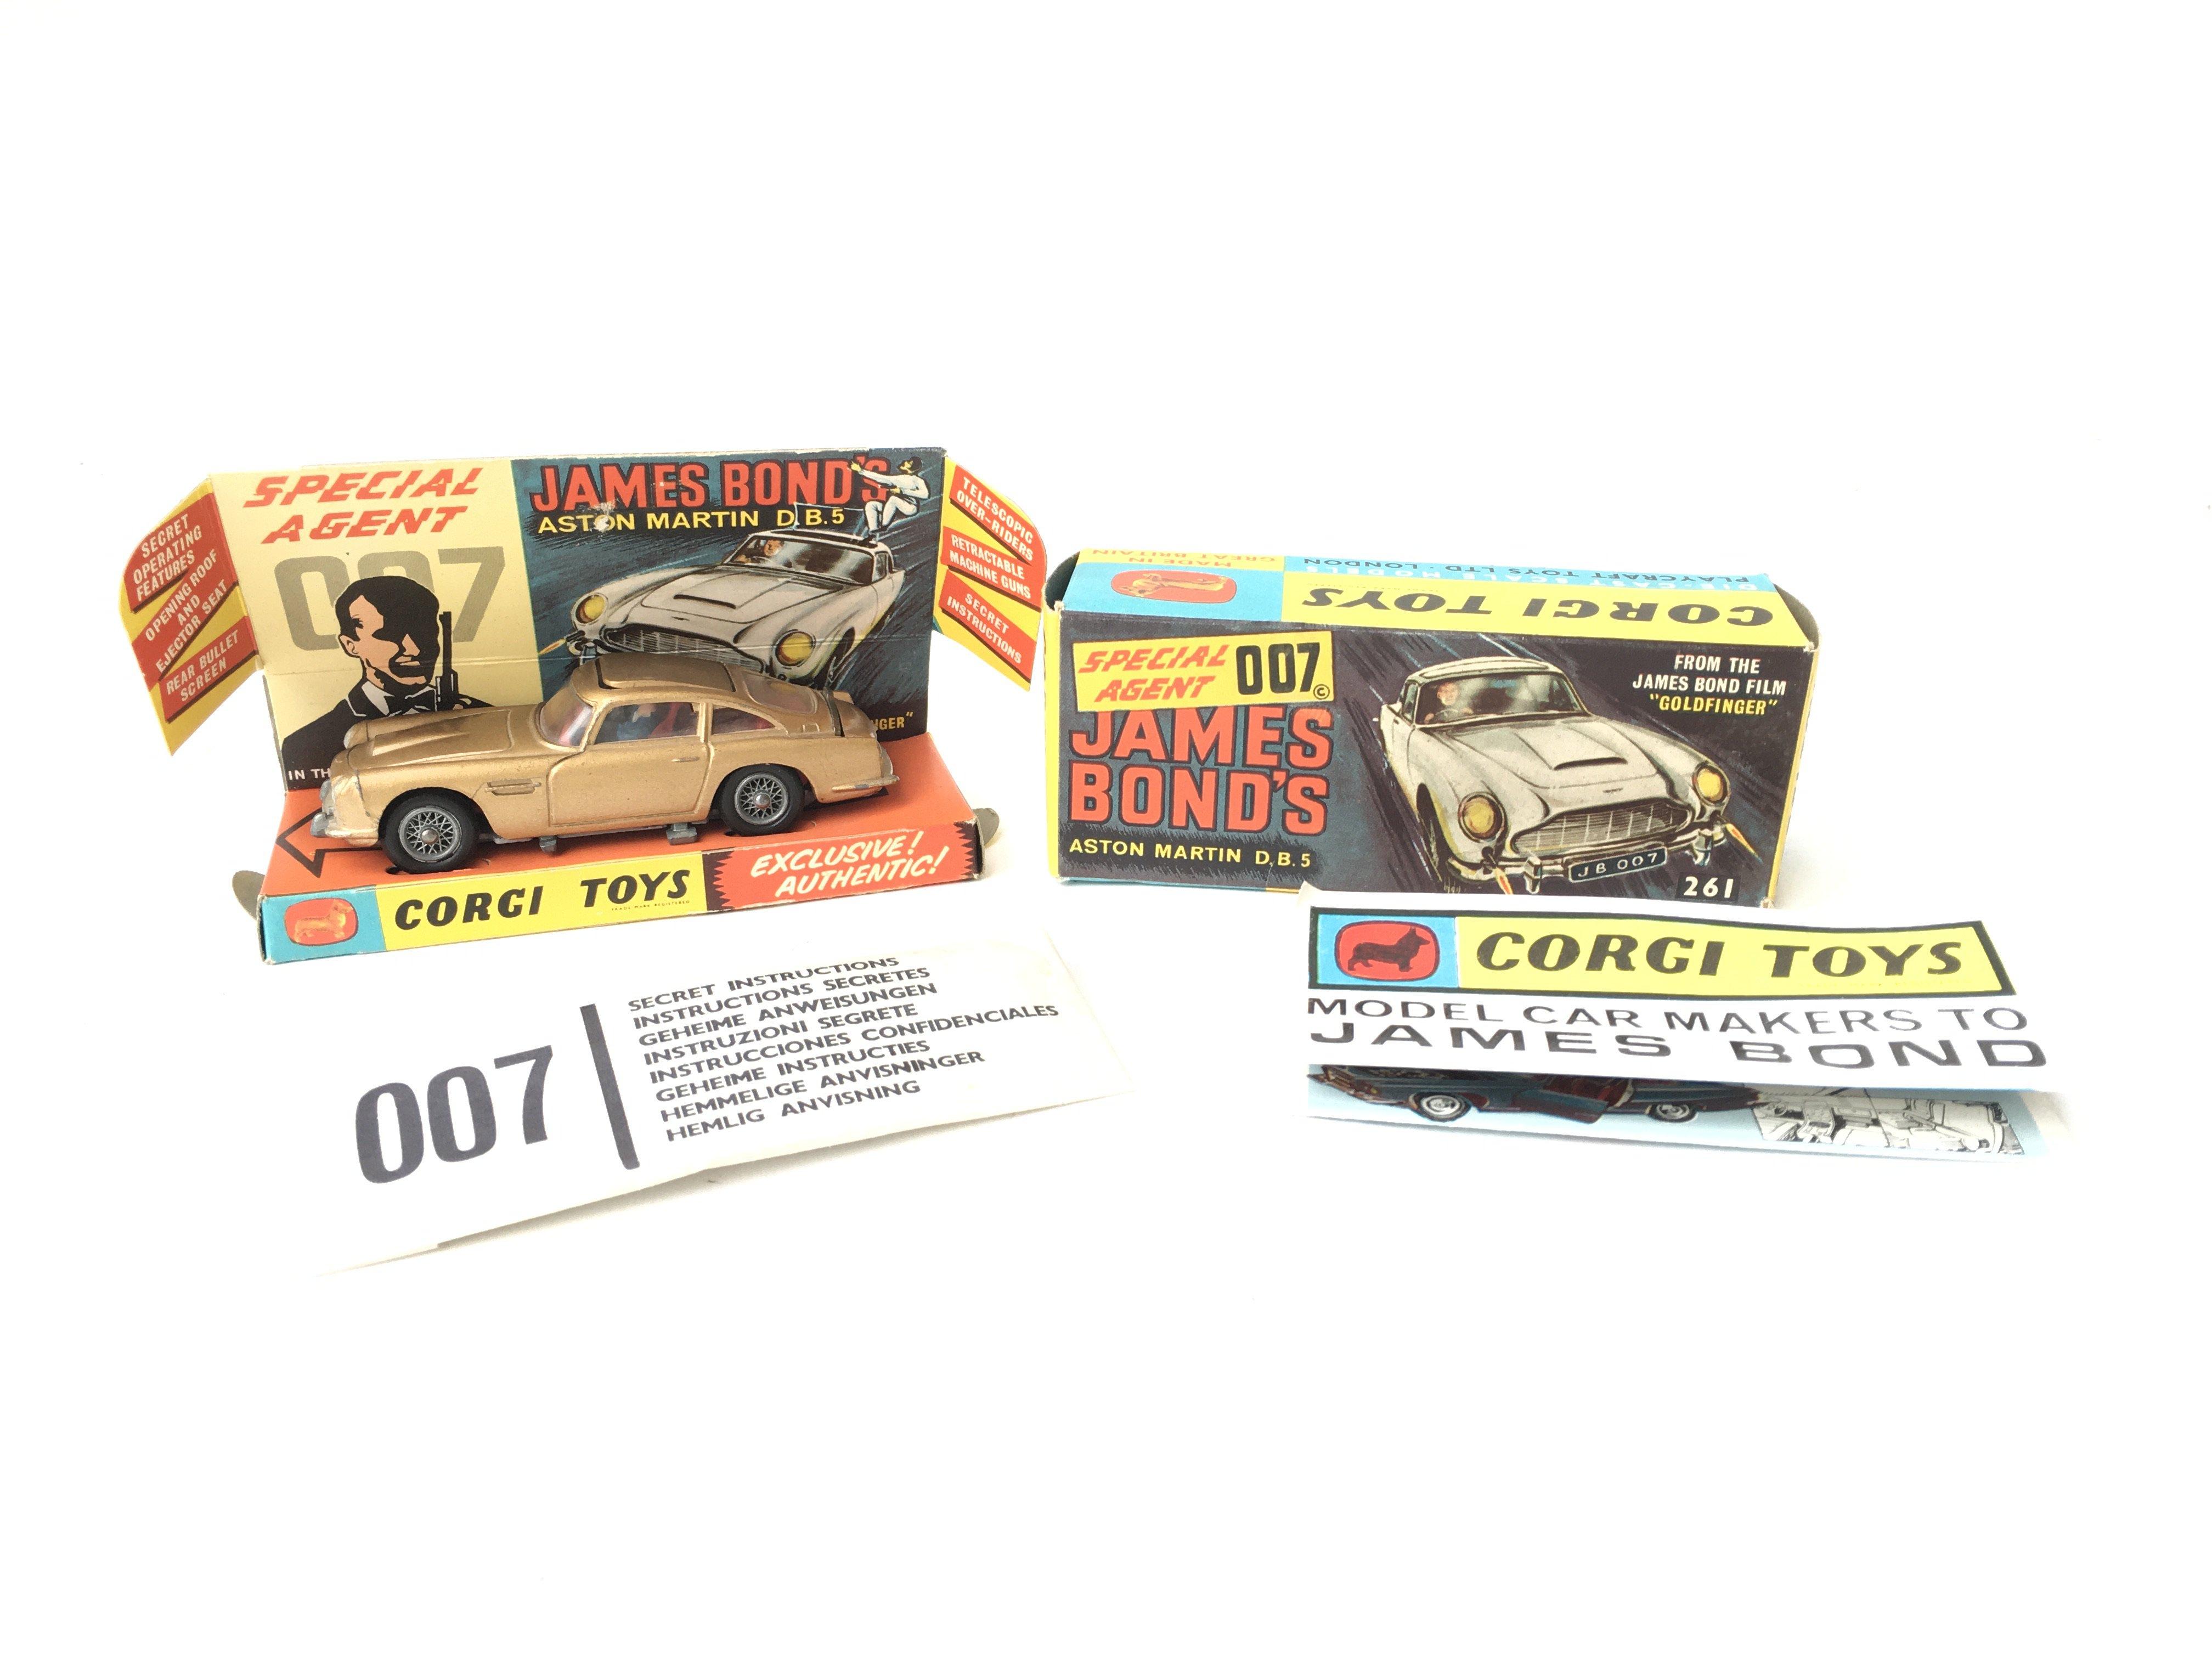 A Boxed Corgi James Bond Aston Martin D.B.5 #261.